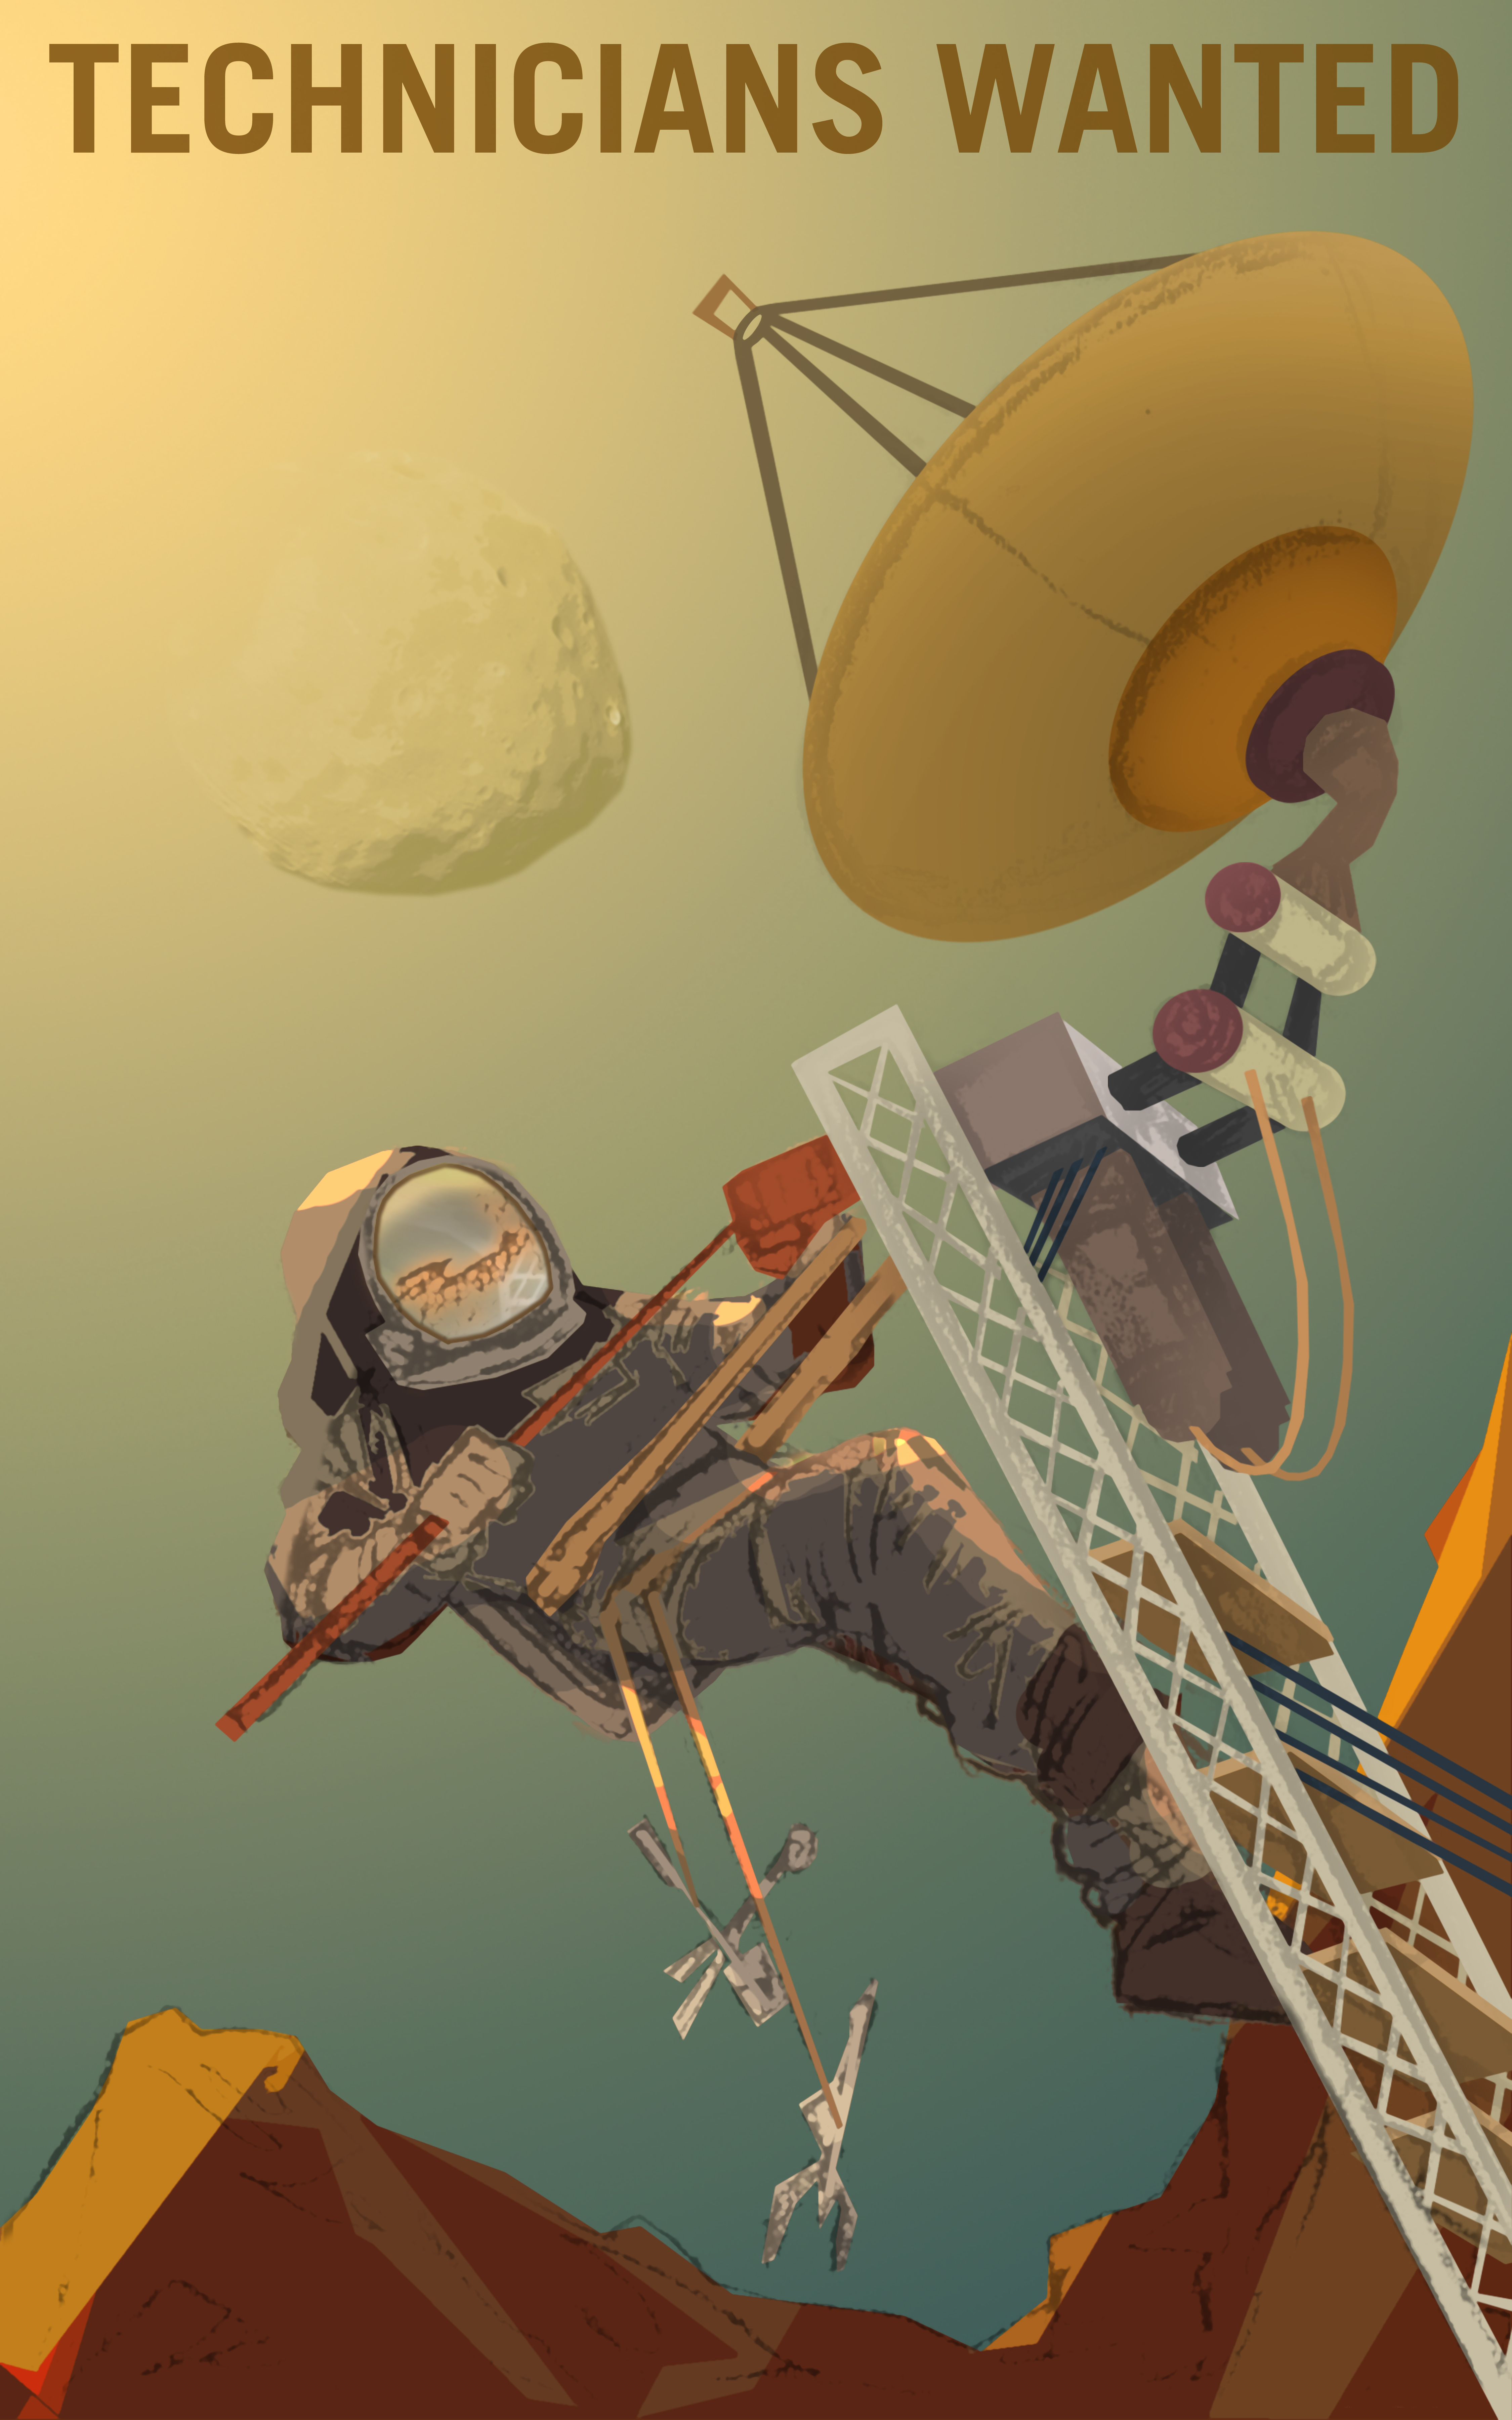 Mars Explorers Wanted Posters | Mars Exploration Program